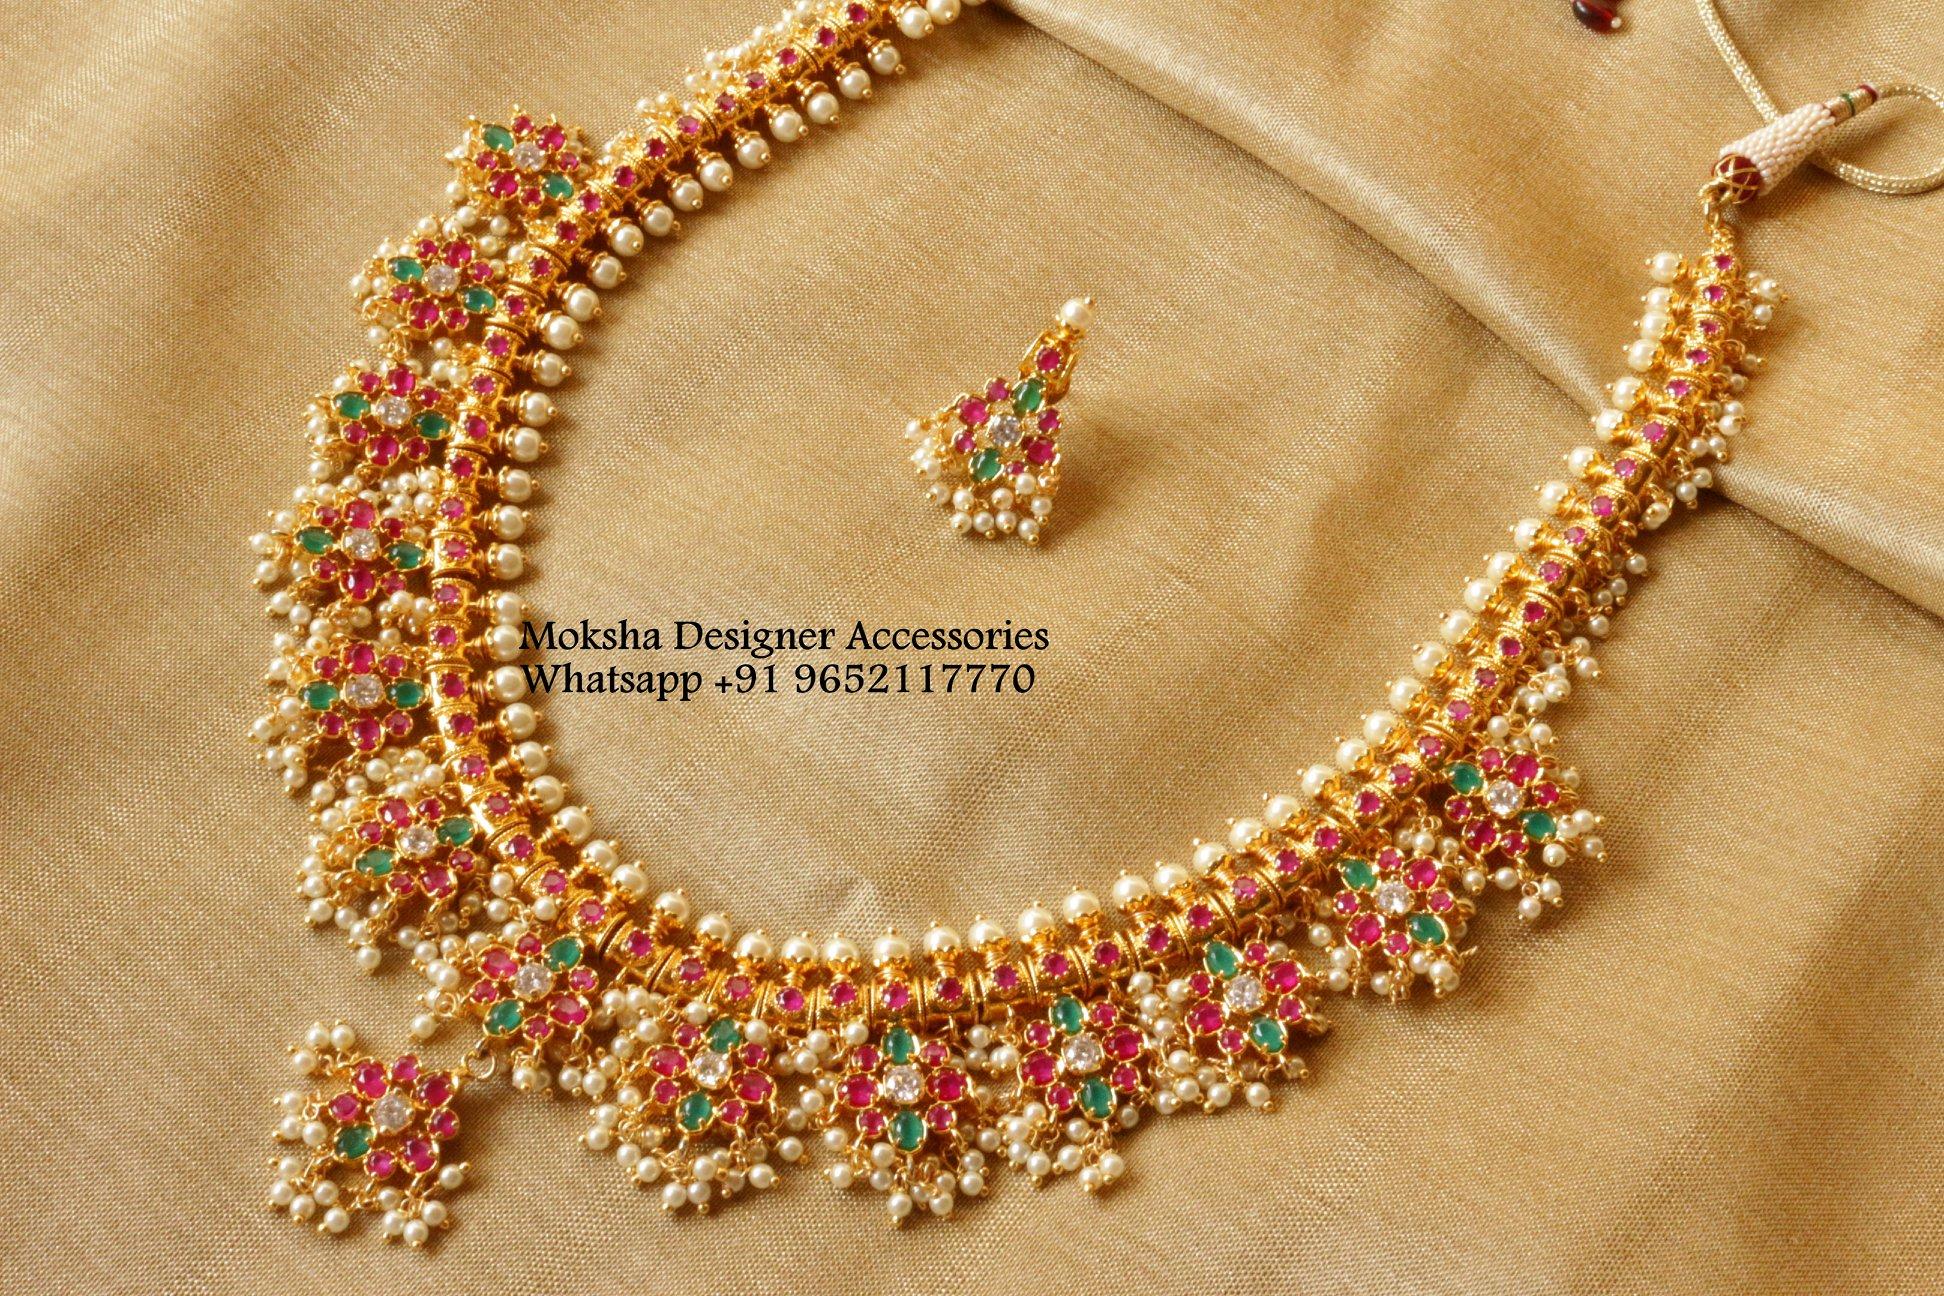 Imitation necklace Moksha Designer Accessories